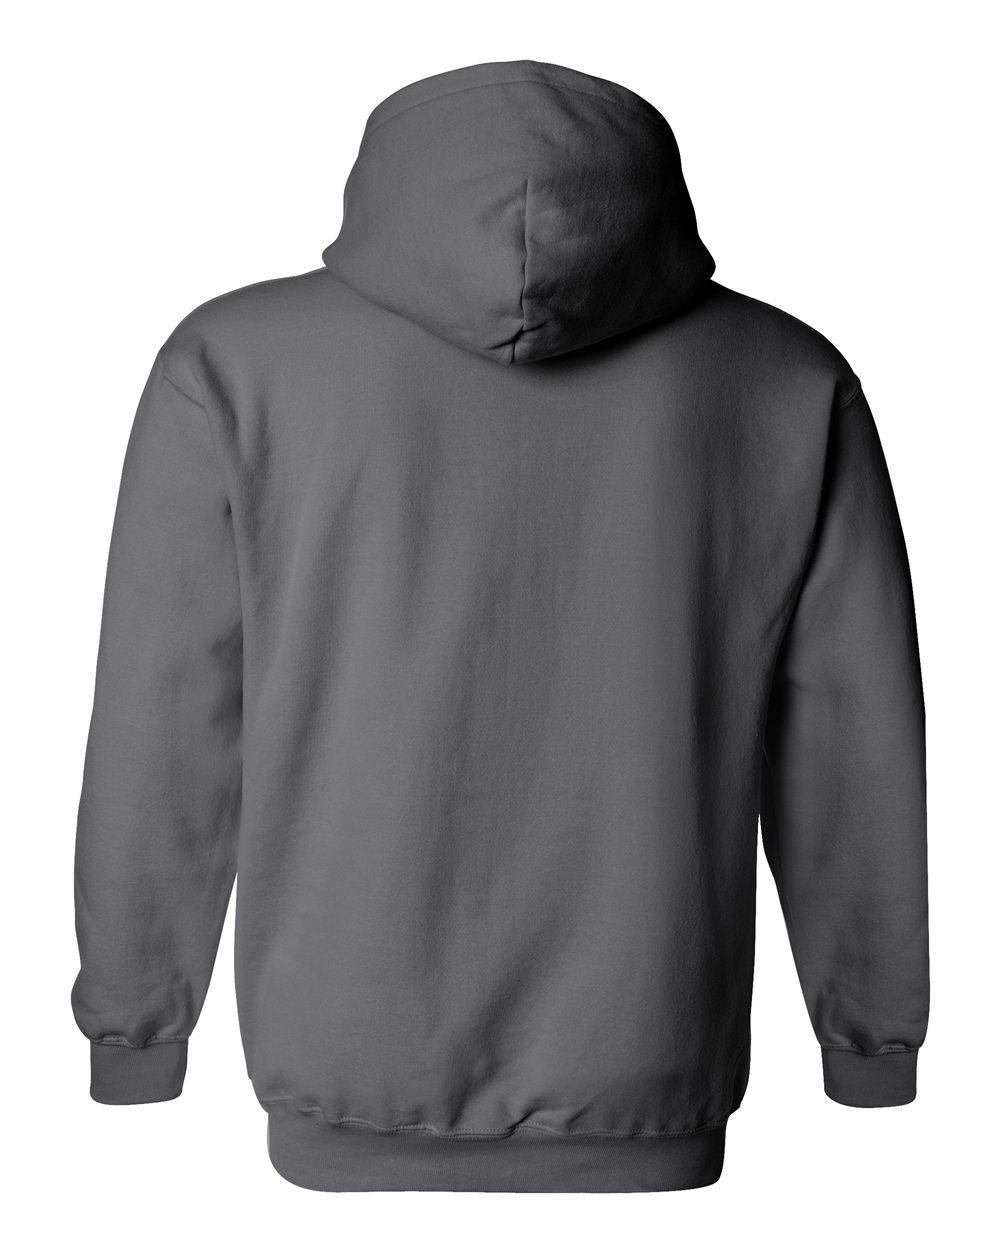 Gildan-Mens-Blank-Hoodie-Heavy-Blend-Hooded-Sweatshirt-Solid-18500-up-to-5XL thumbnail 19